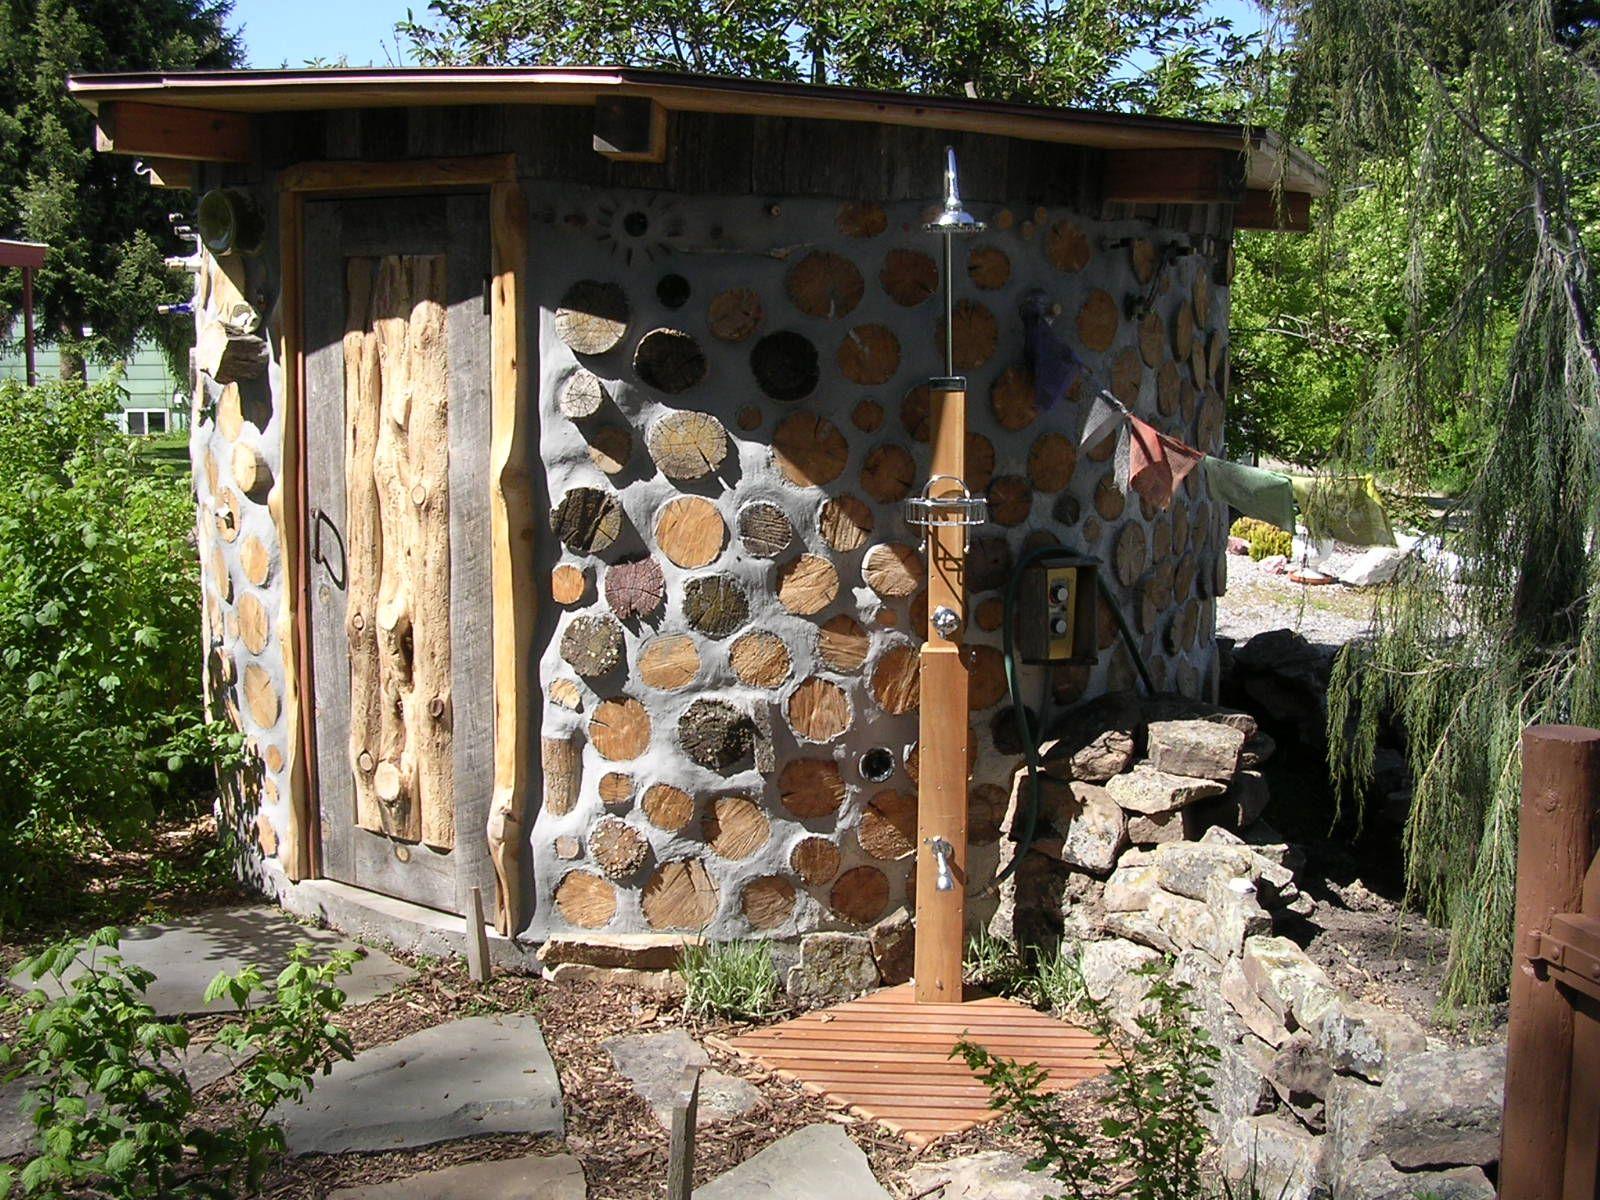 I With Friends Built This Monolithic Earth Roof Cordwood Sauna Every Piece Has A Story Good Memories And Hard To Leave B Sweat Lodge Sauna Diy Homemade Sauna Backyard diy sweat lodge